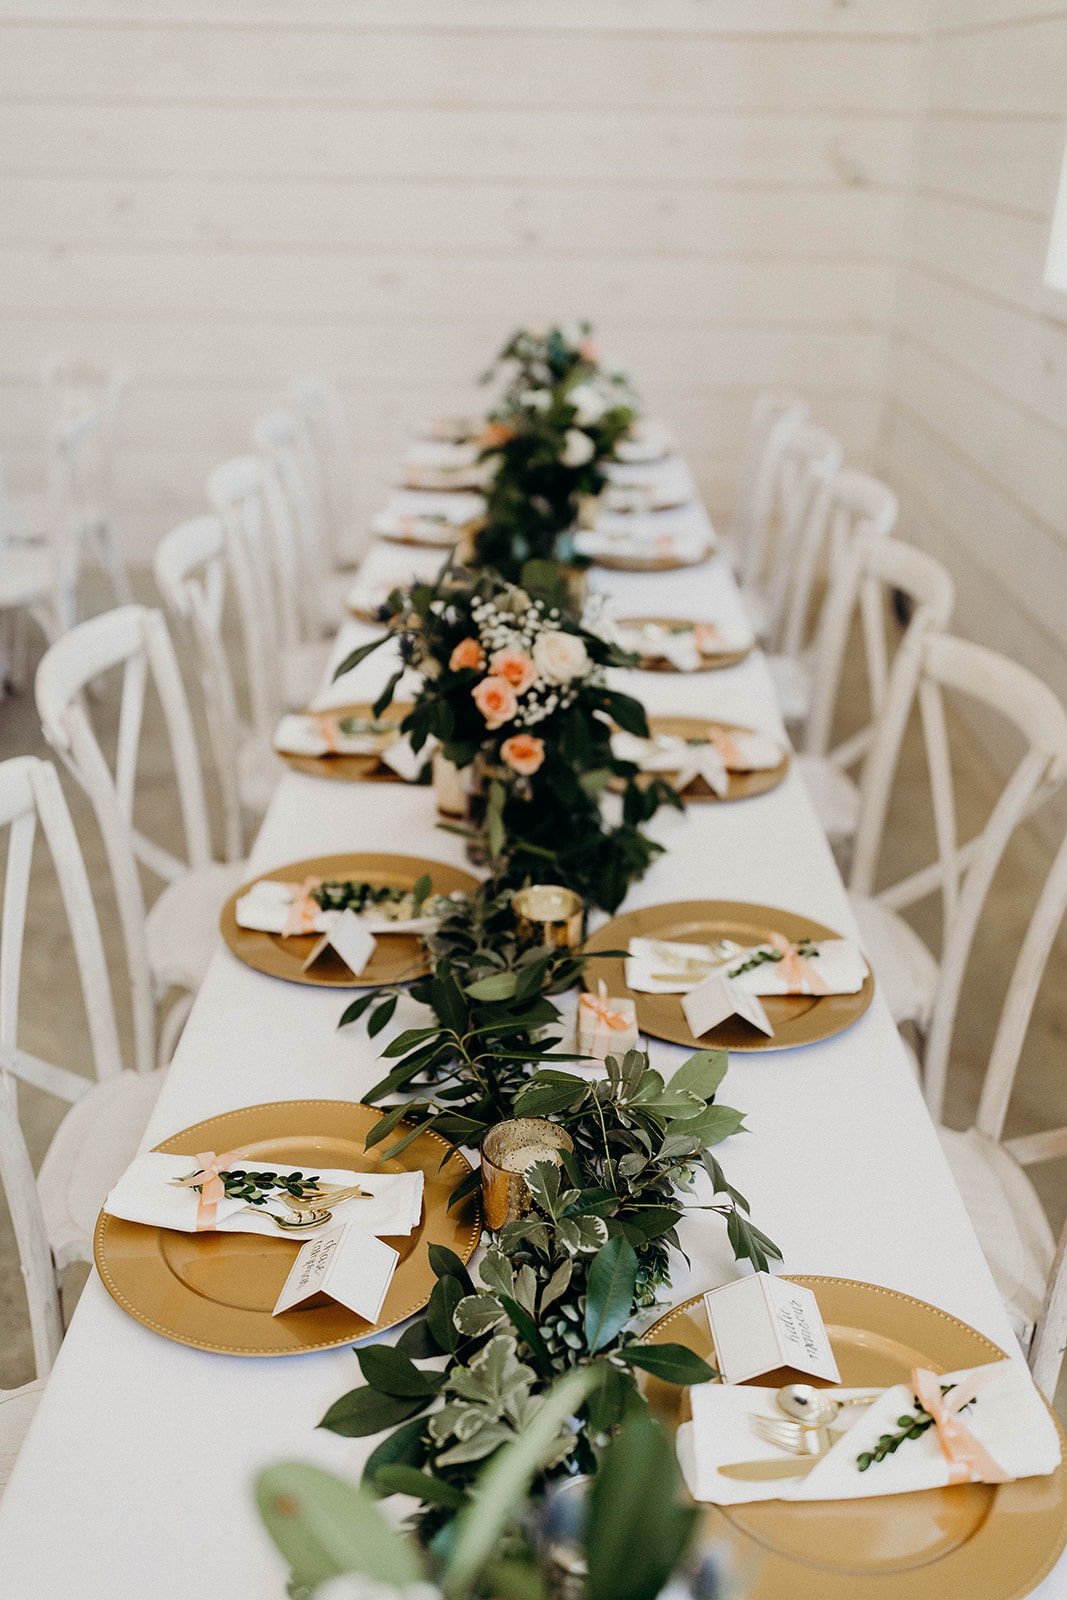 Proactive Wedding Planning Amid Pandemic